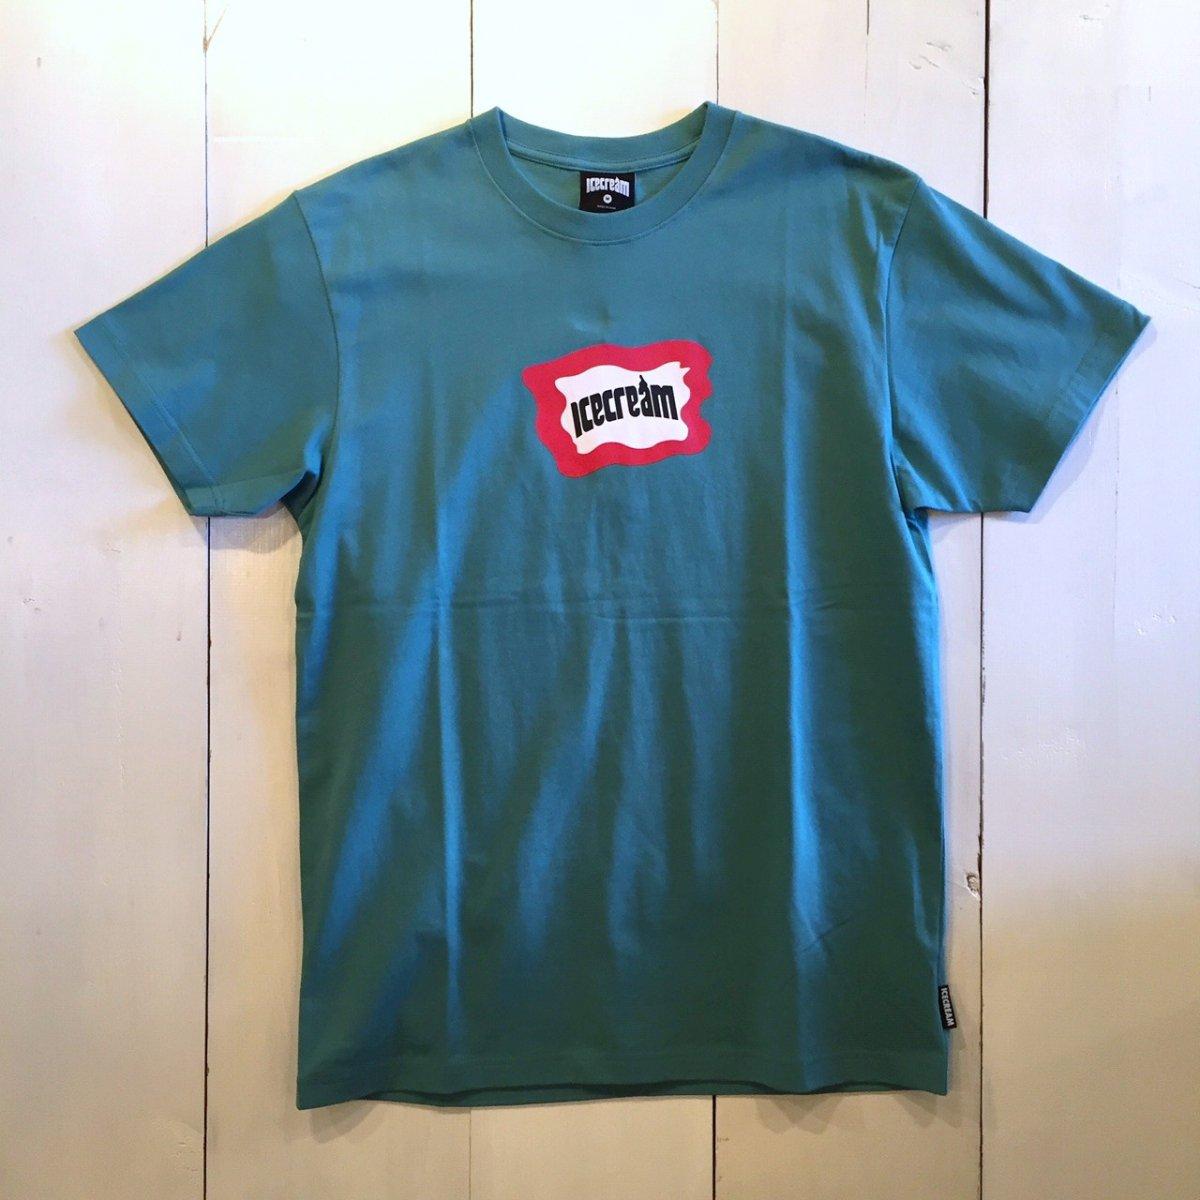 <img class='new_mark_img1' src='https://img.shop-pro.jp/img/new/icons3.gif' style='border:none;display:inline;margin:0px;padding:0px;width:auto;' />ICE CREAM アイスクリーム / Tシャツ MALTO T-SHIRTS 【SLATE BLUE】